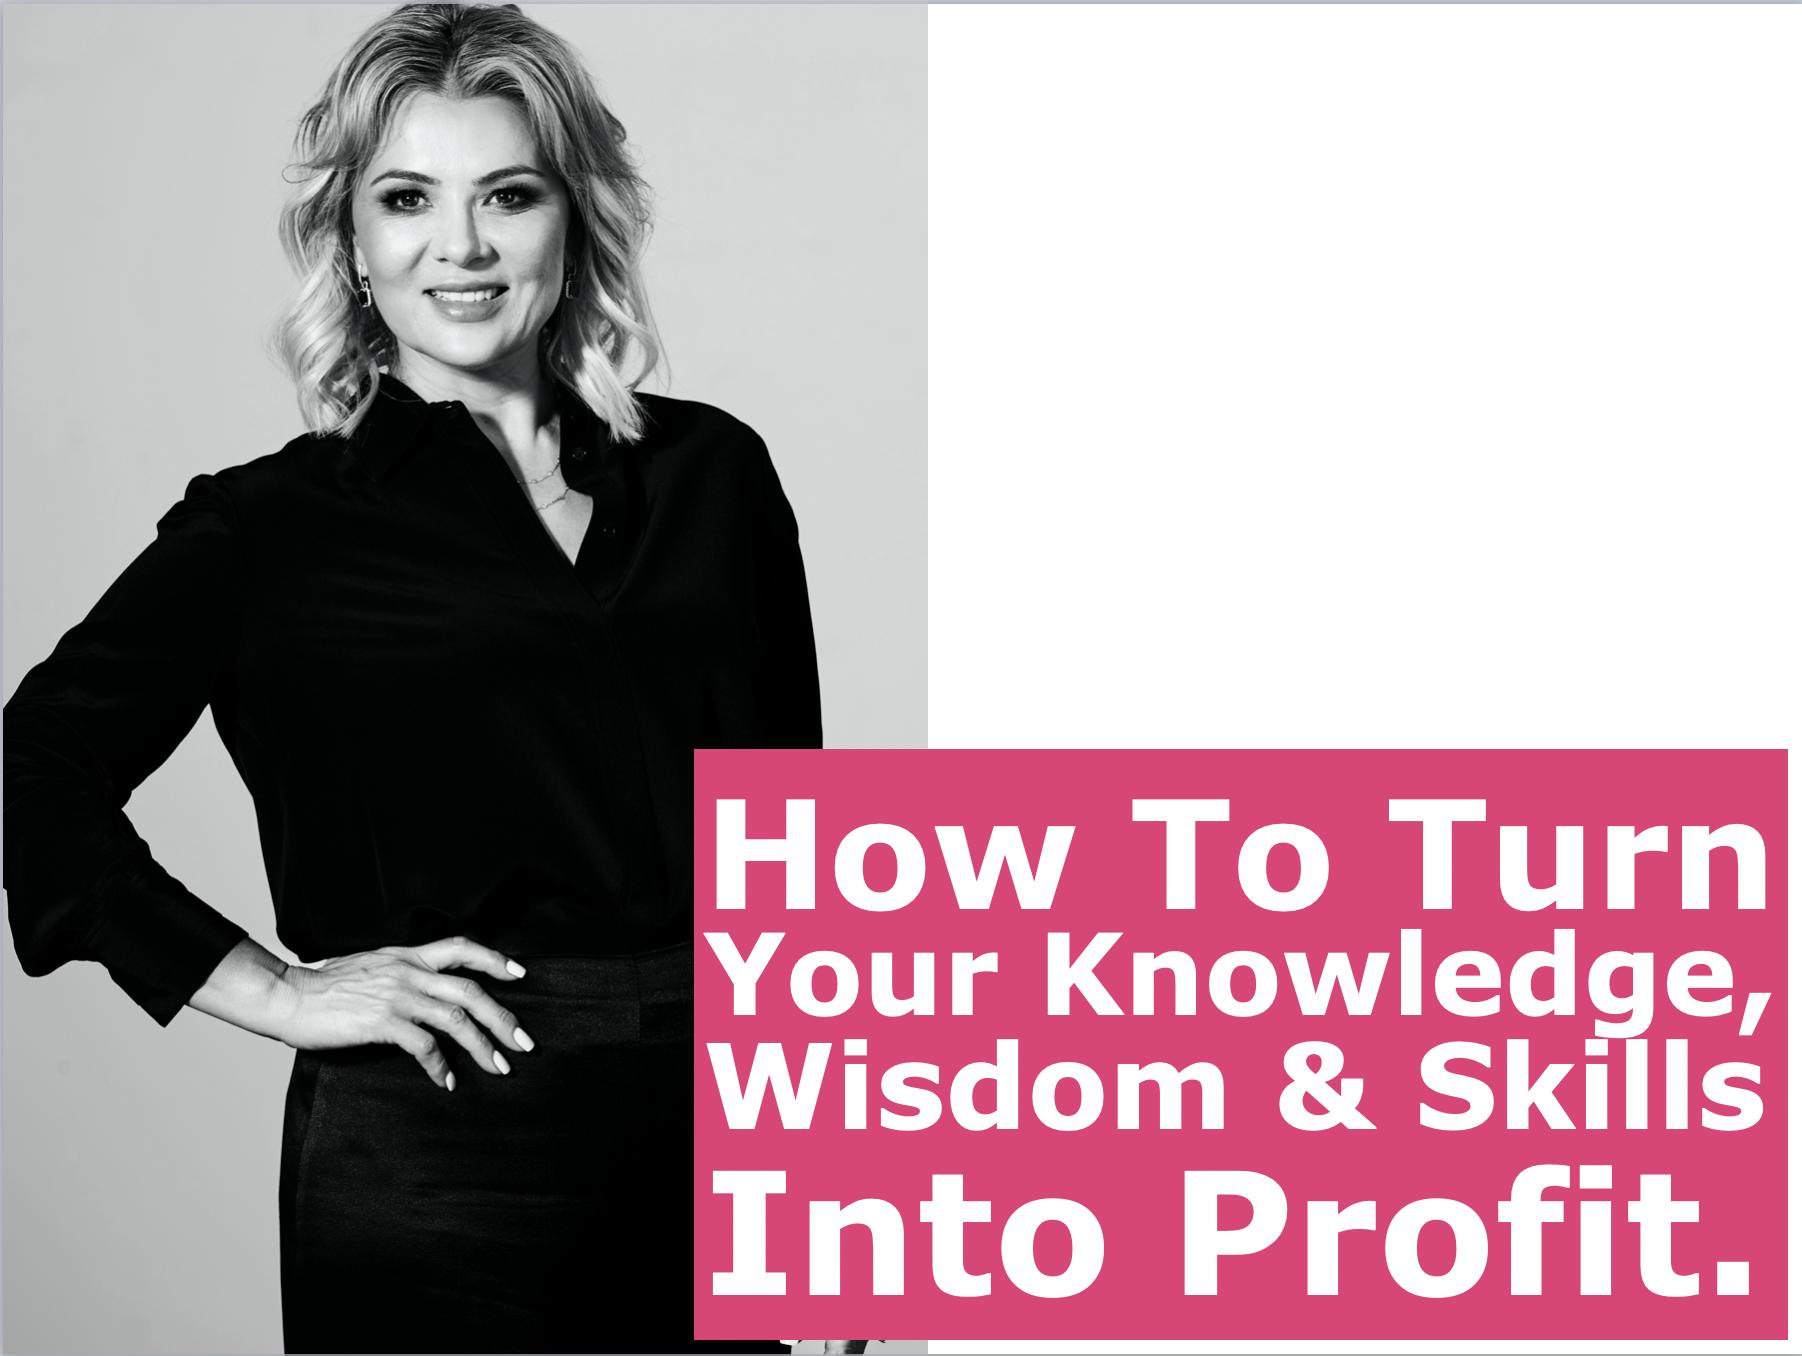 how to turn your knowledge, wisdom & skills. Into profit